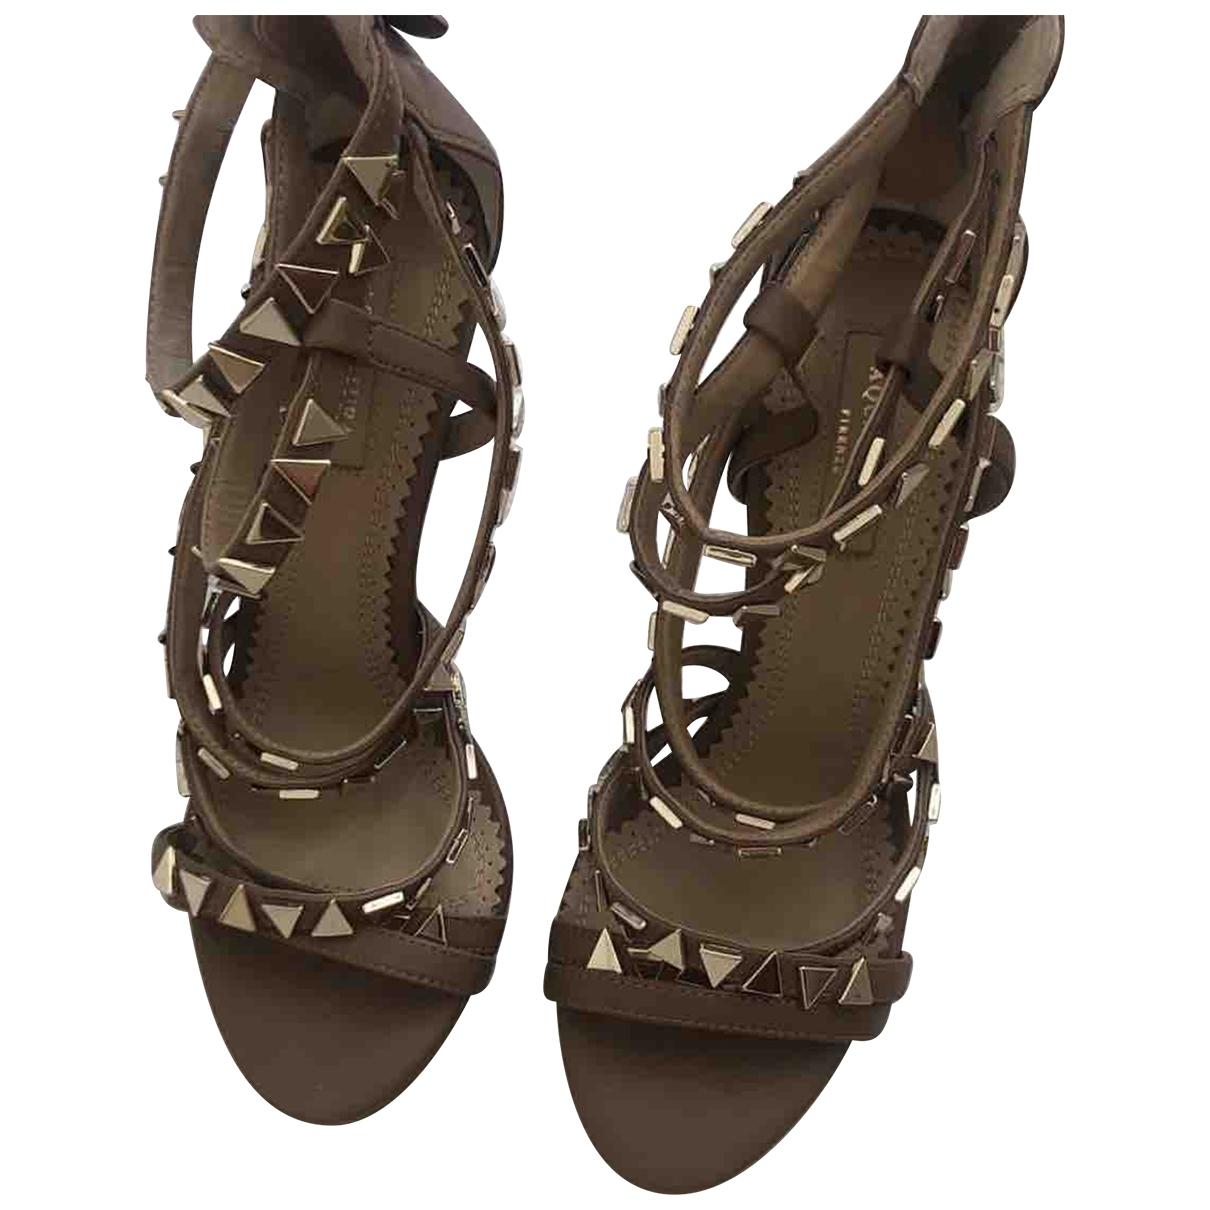 Aquazzura \N Camel Leather Sandals for Women 36 EU